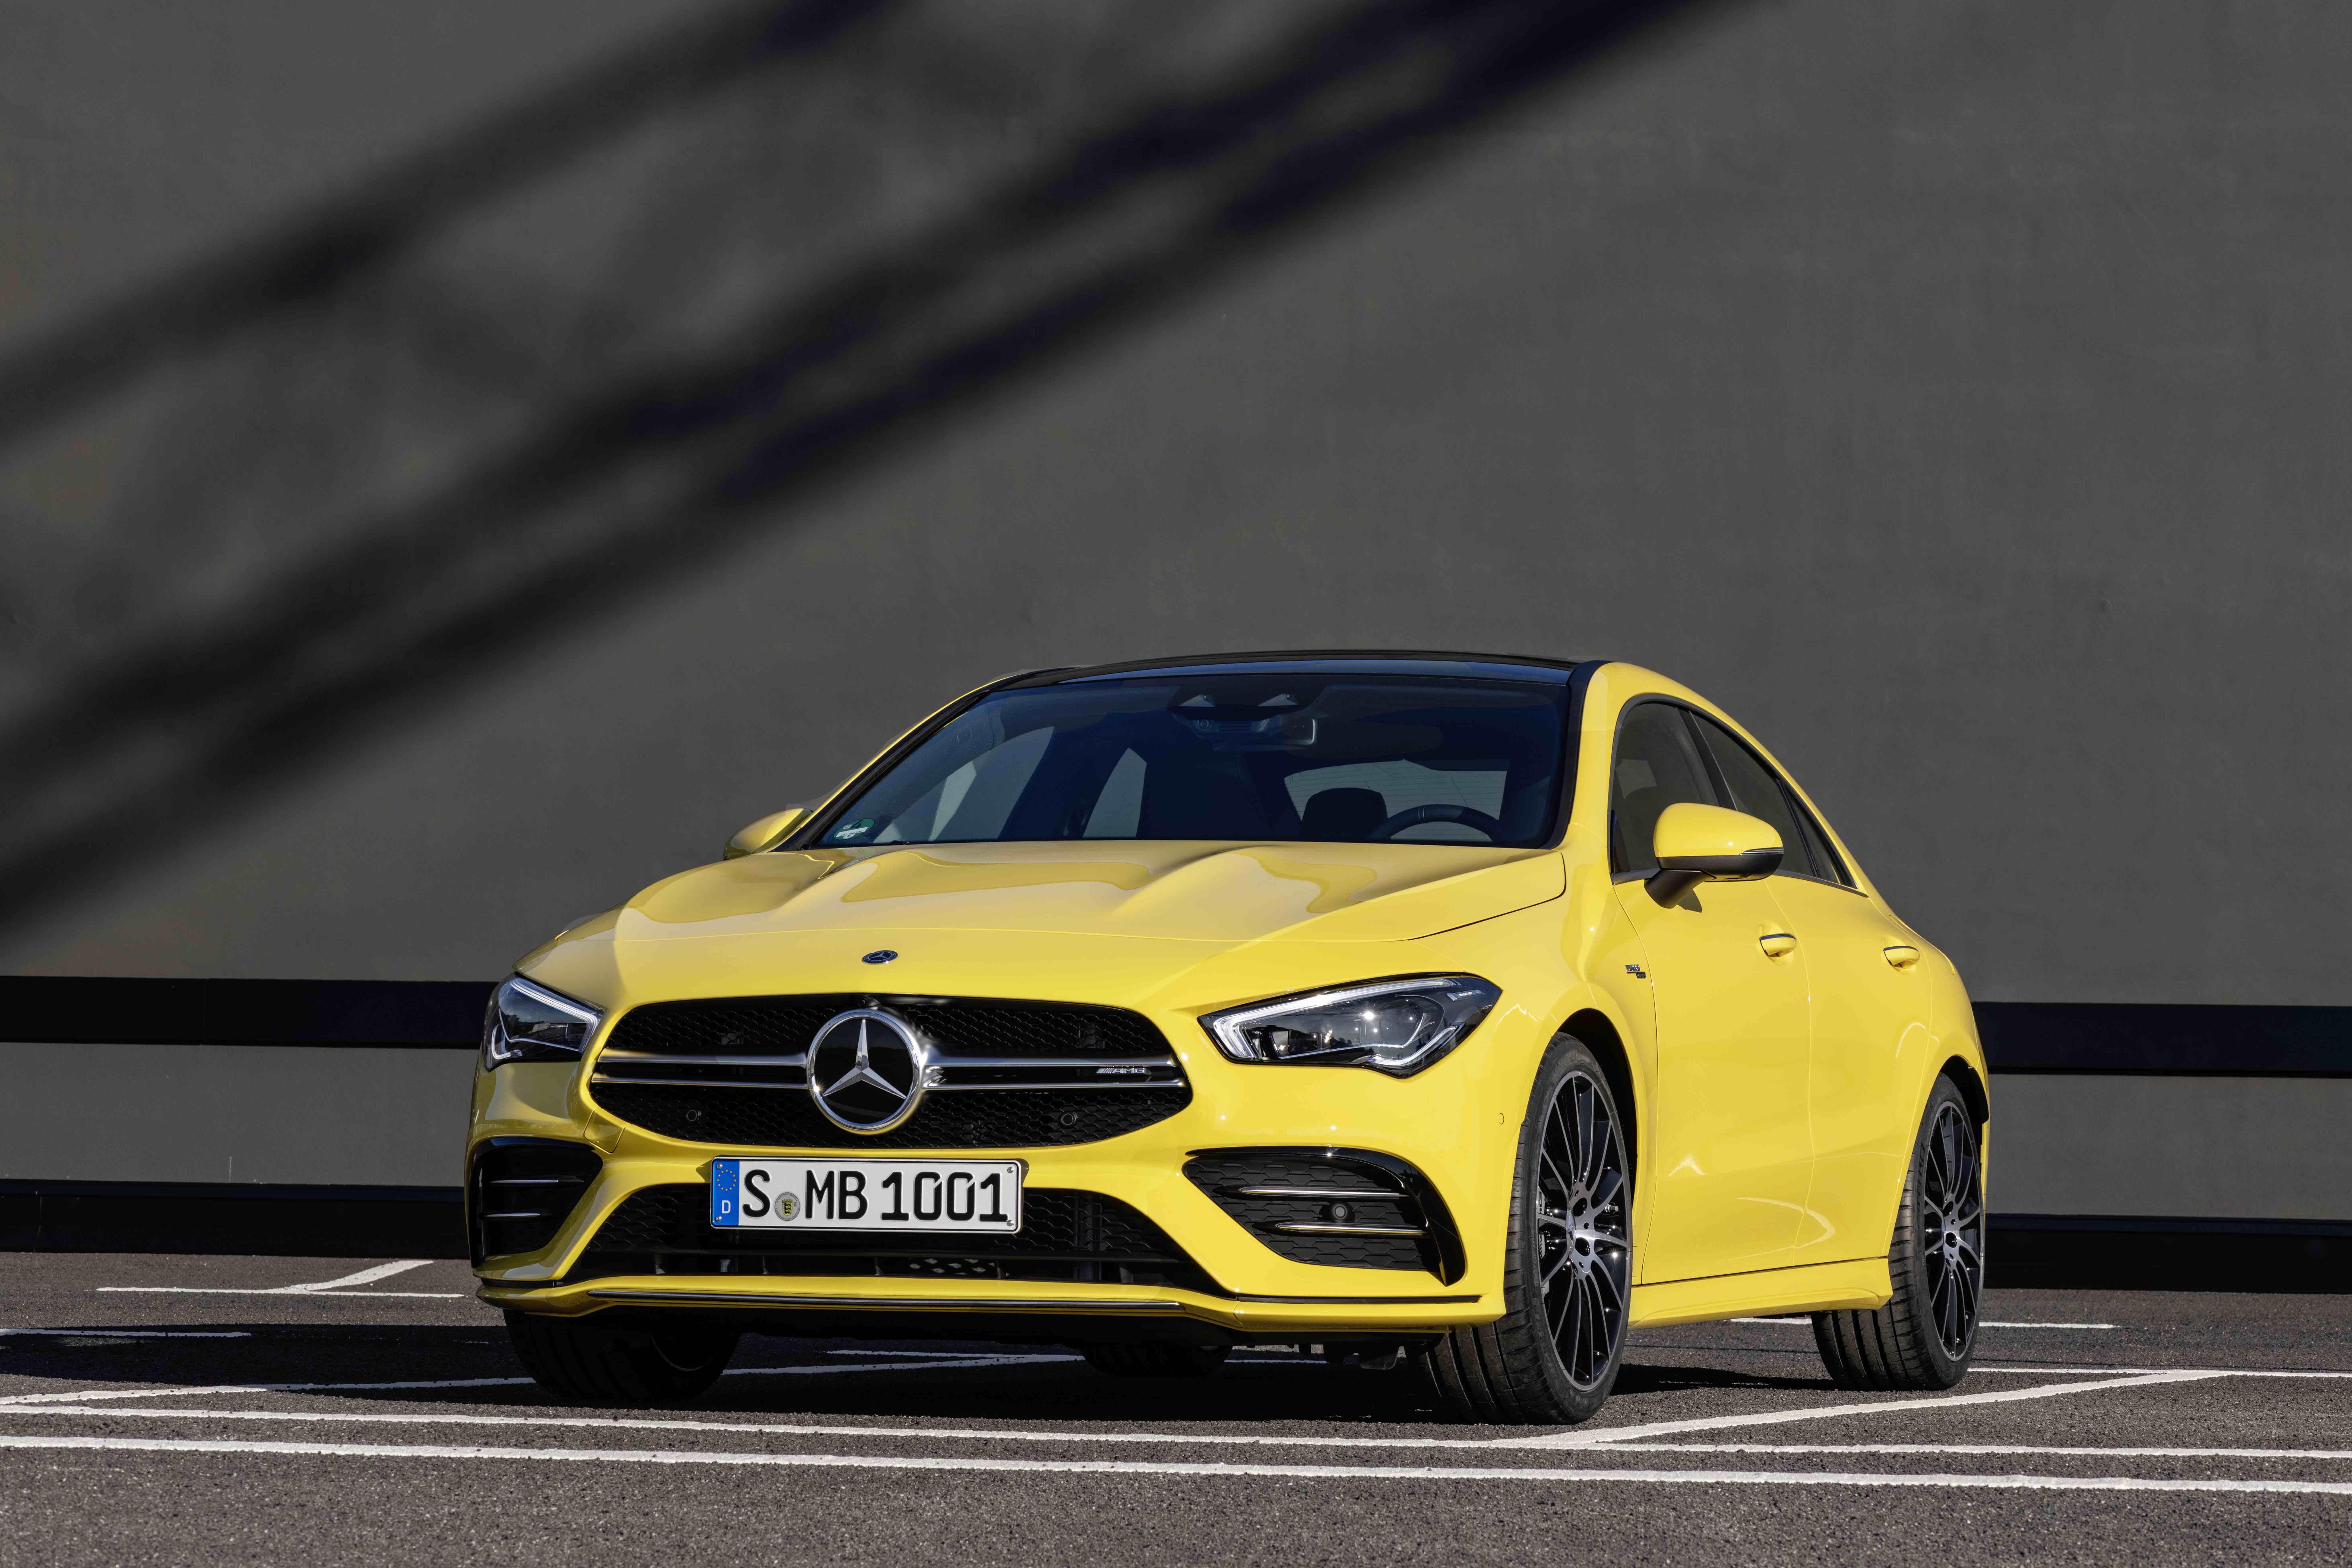 Mercedes-AMG CLA 35 4MATIC